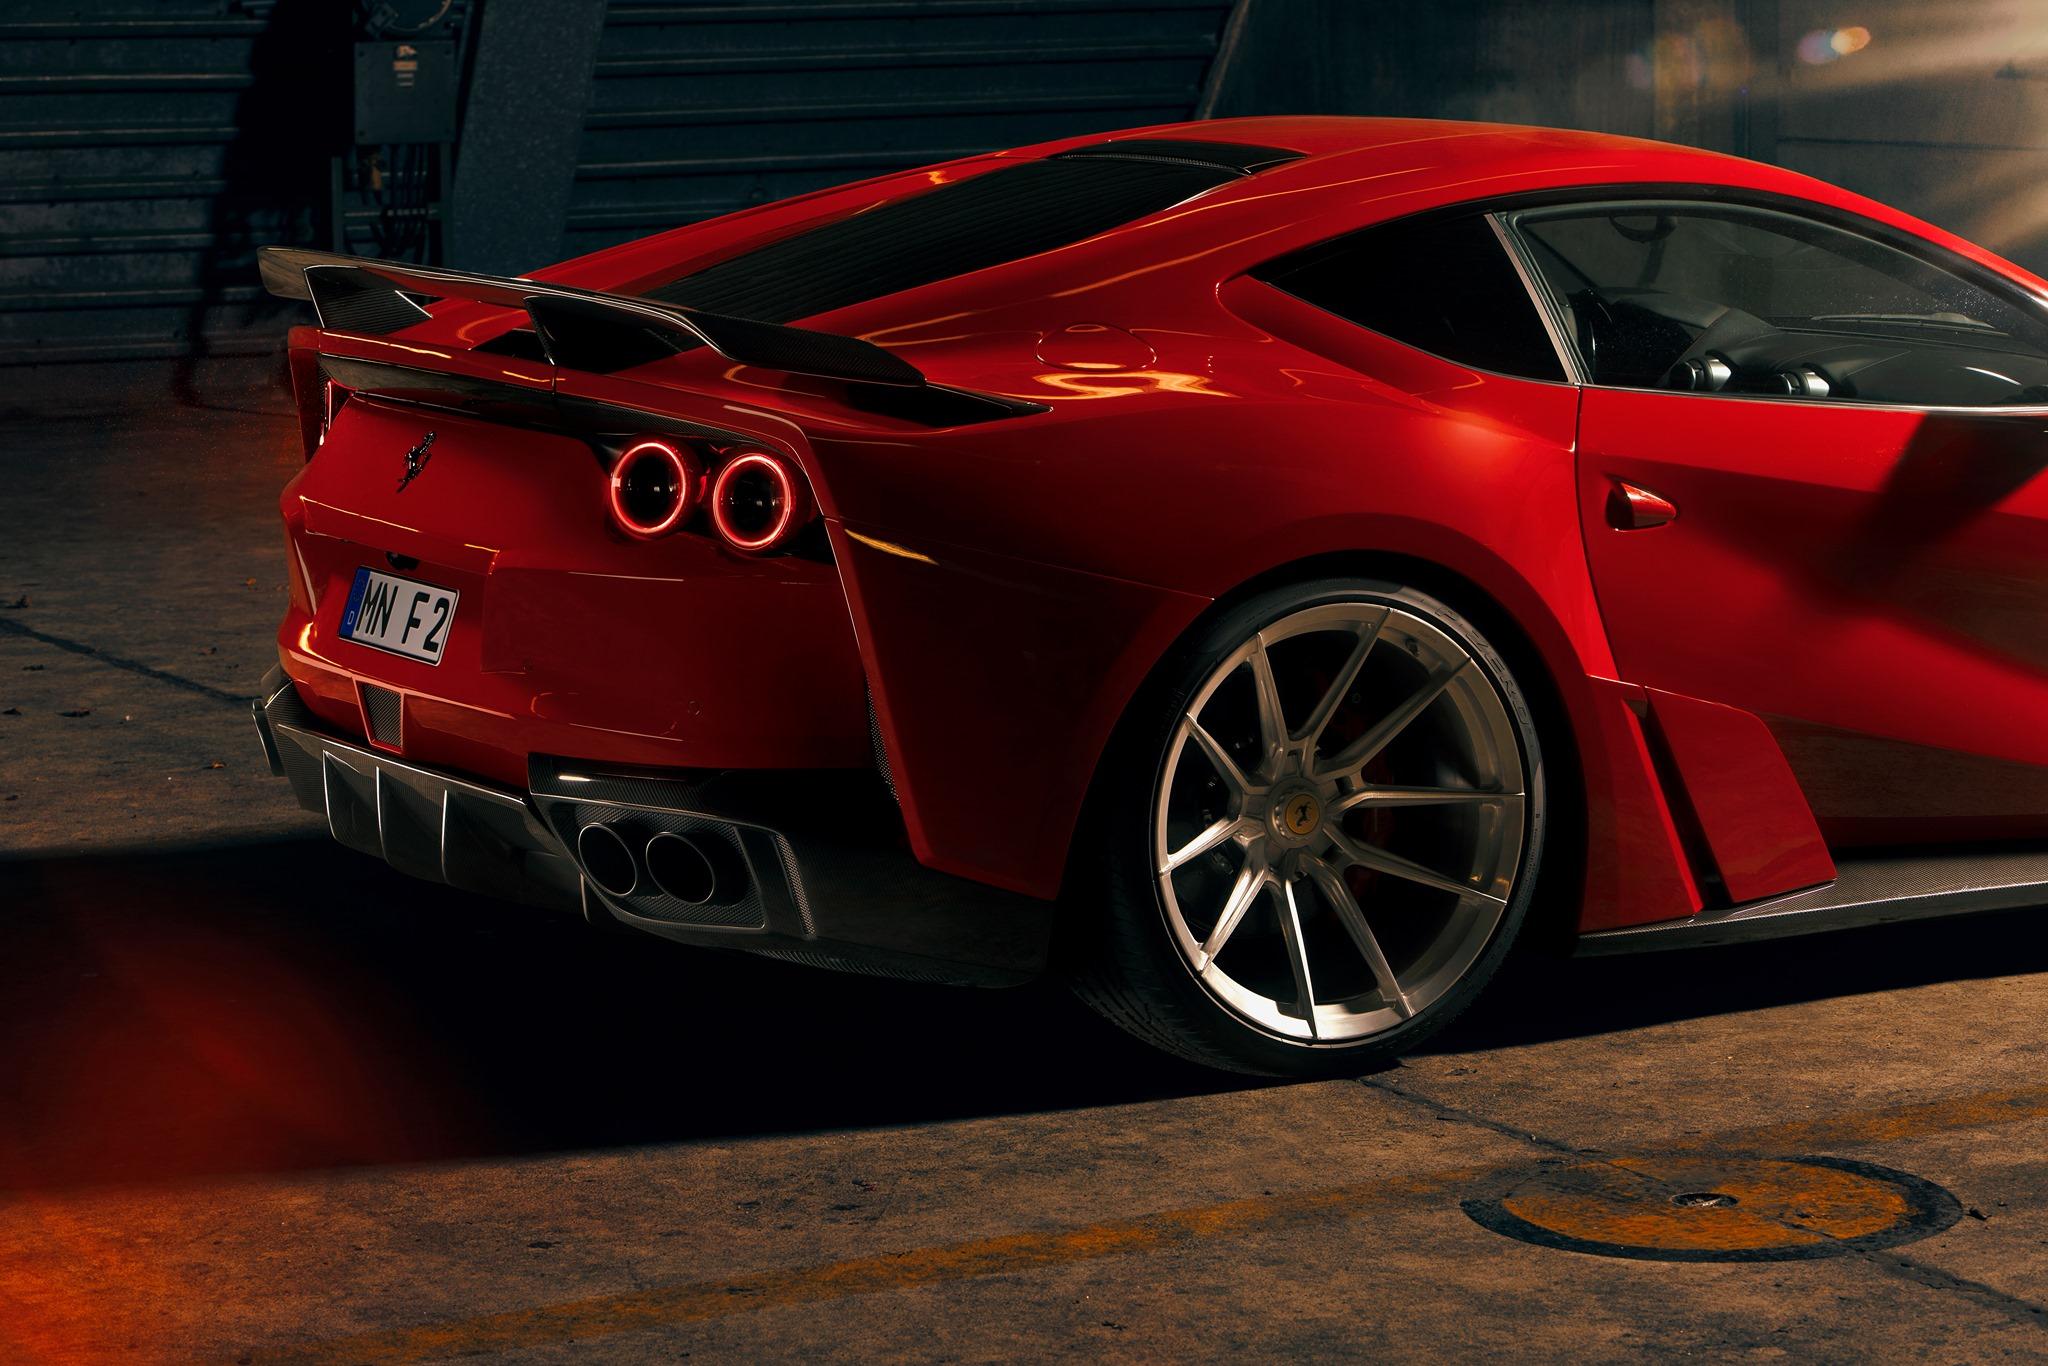 Ferrari-812-Superfast-N-Largo-by-Novitec-11